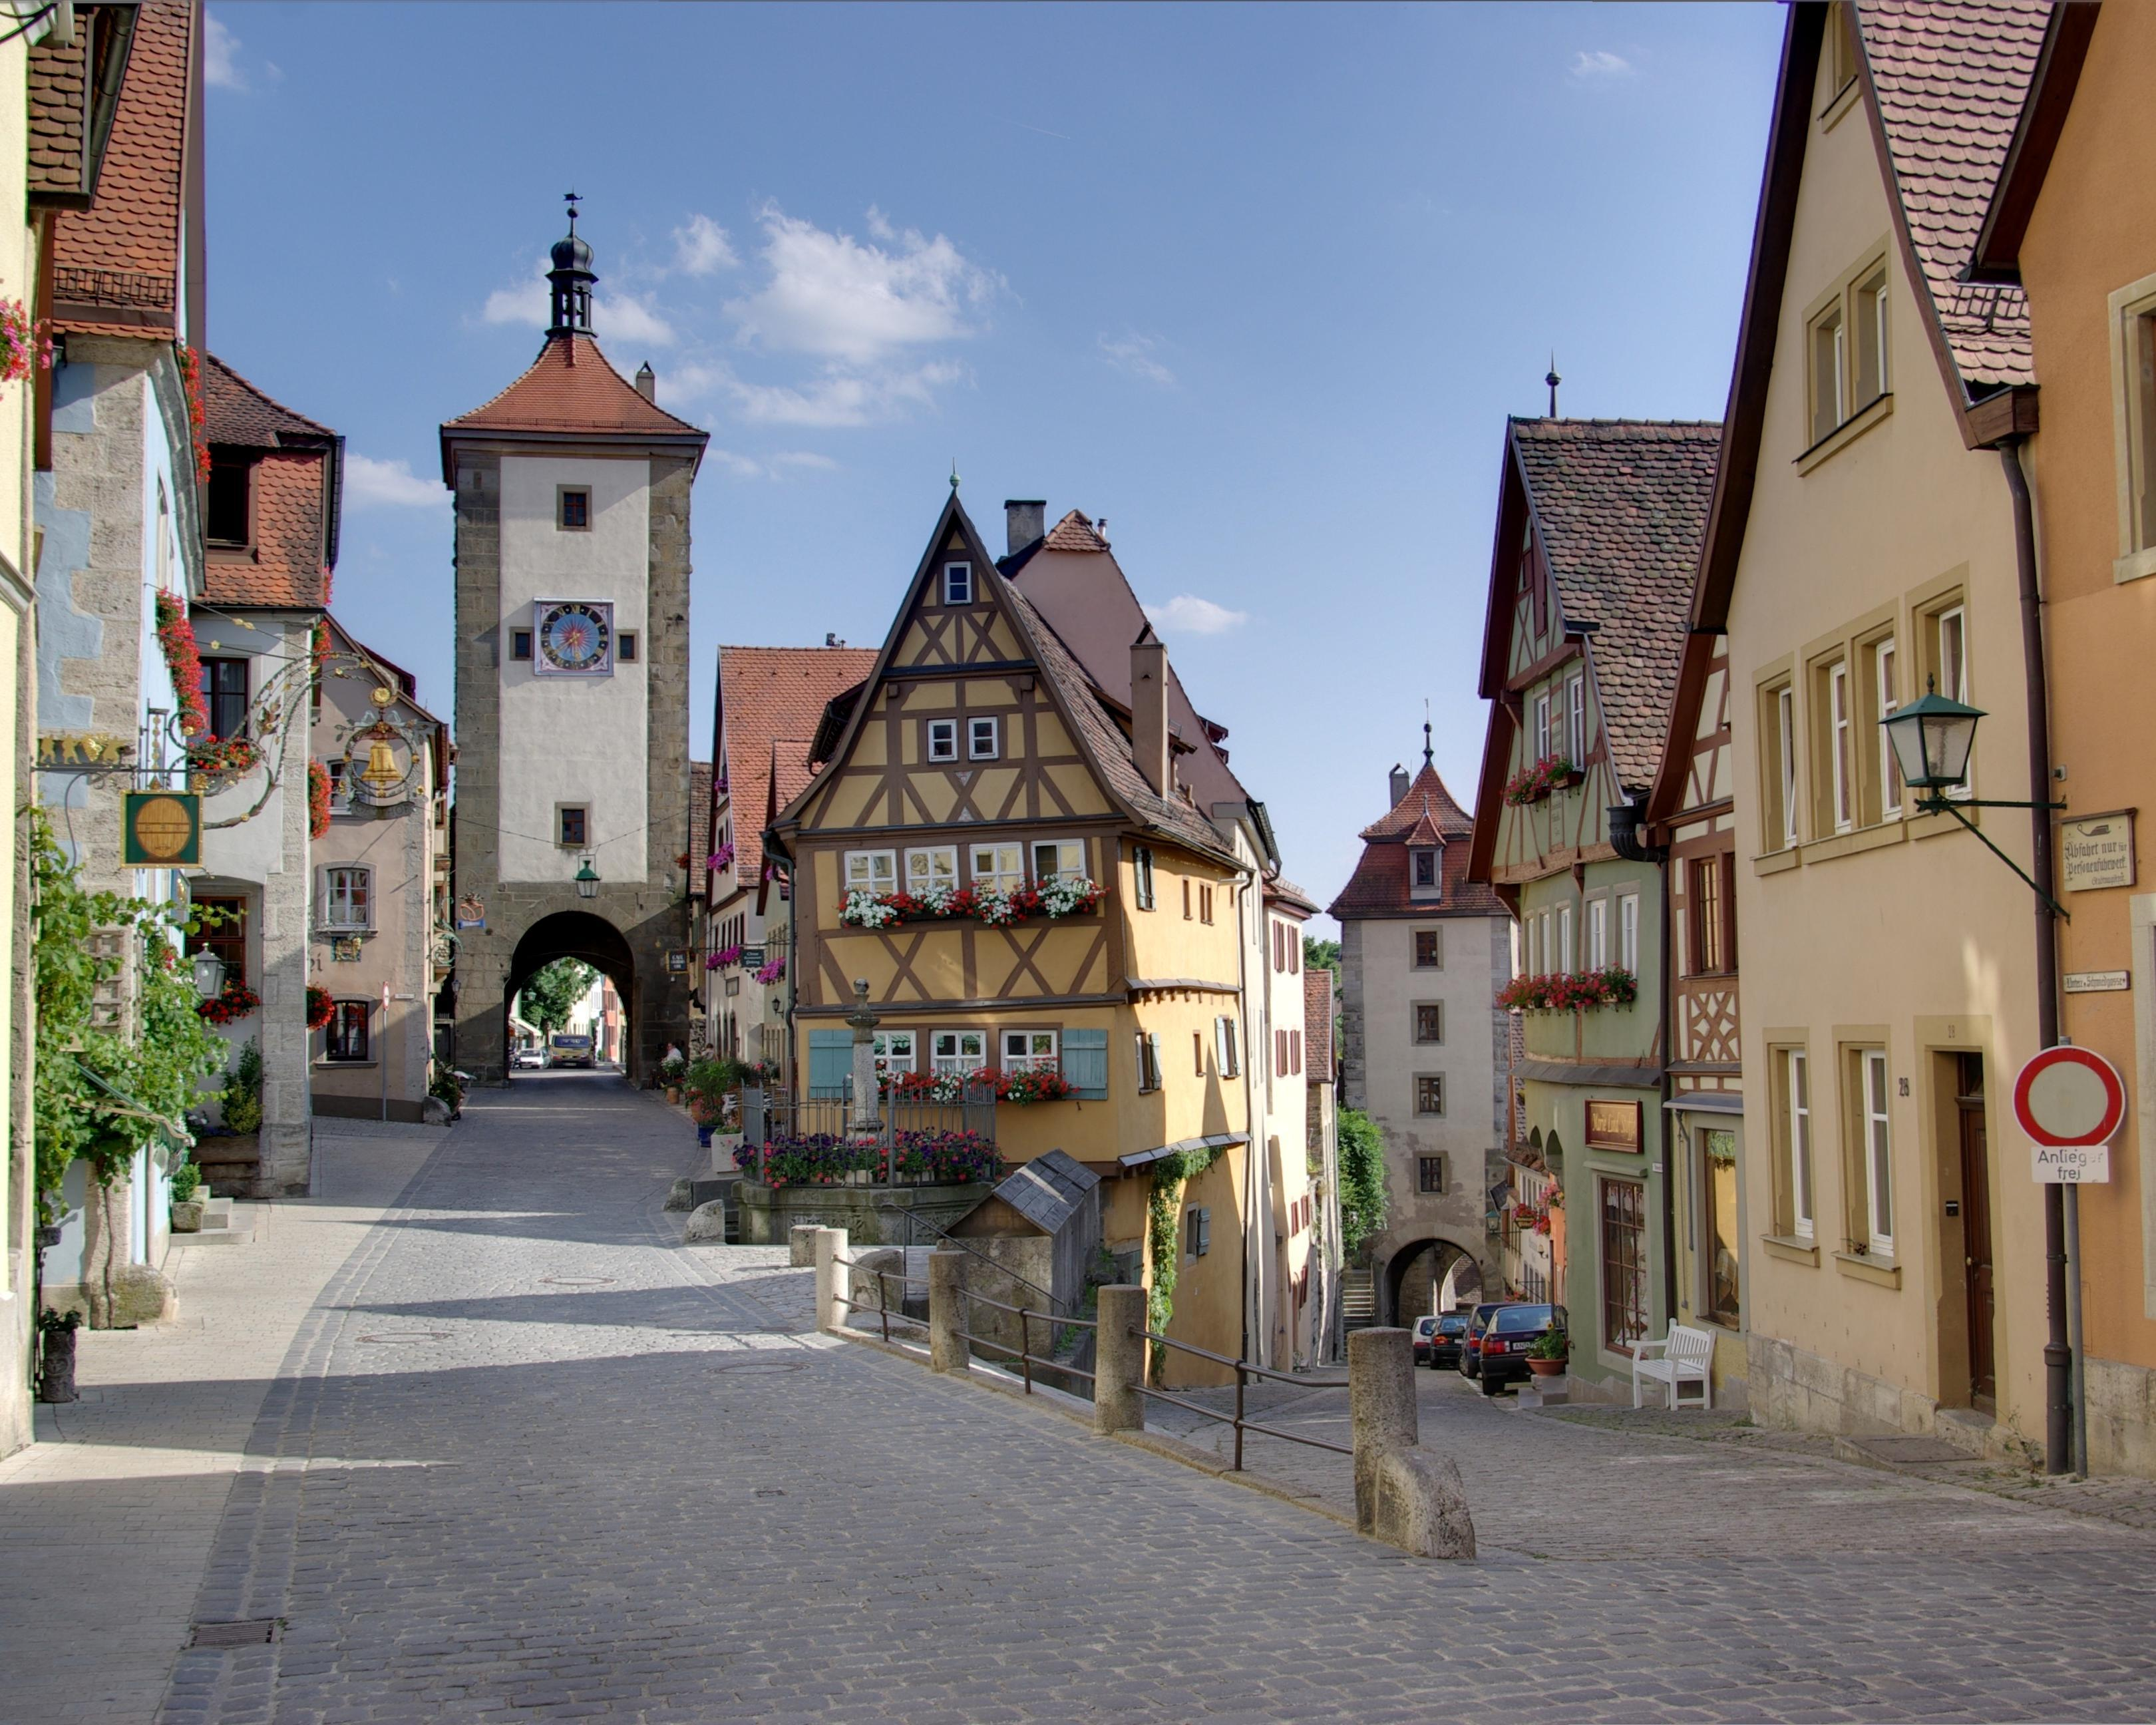 Alemania Rothenburg ob der Tauber